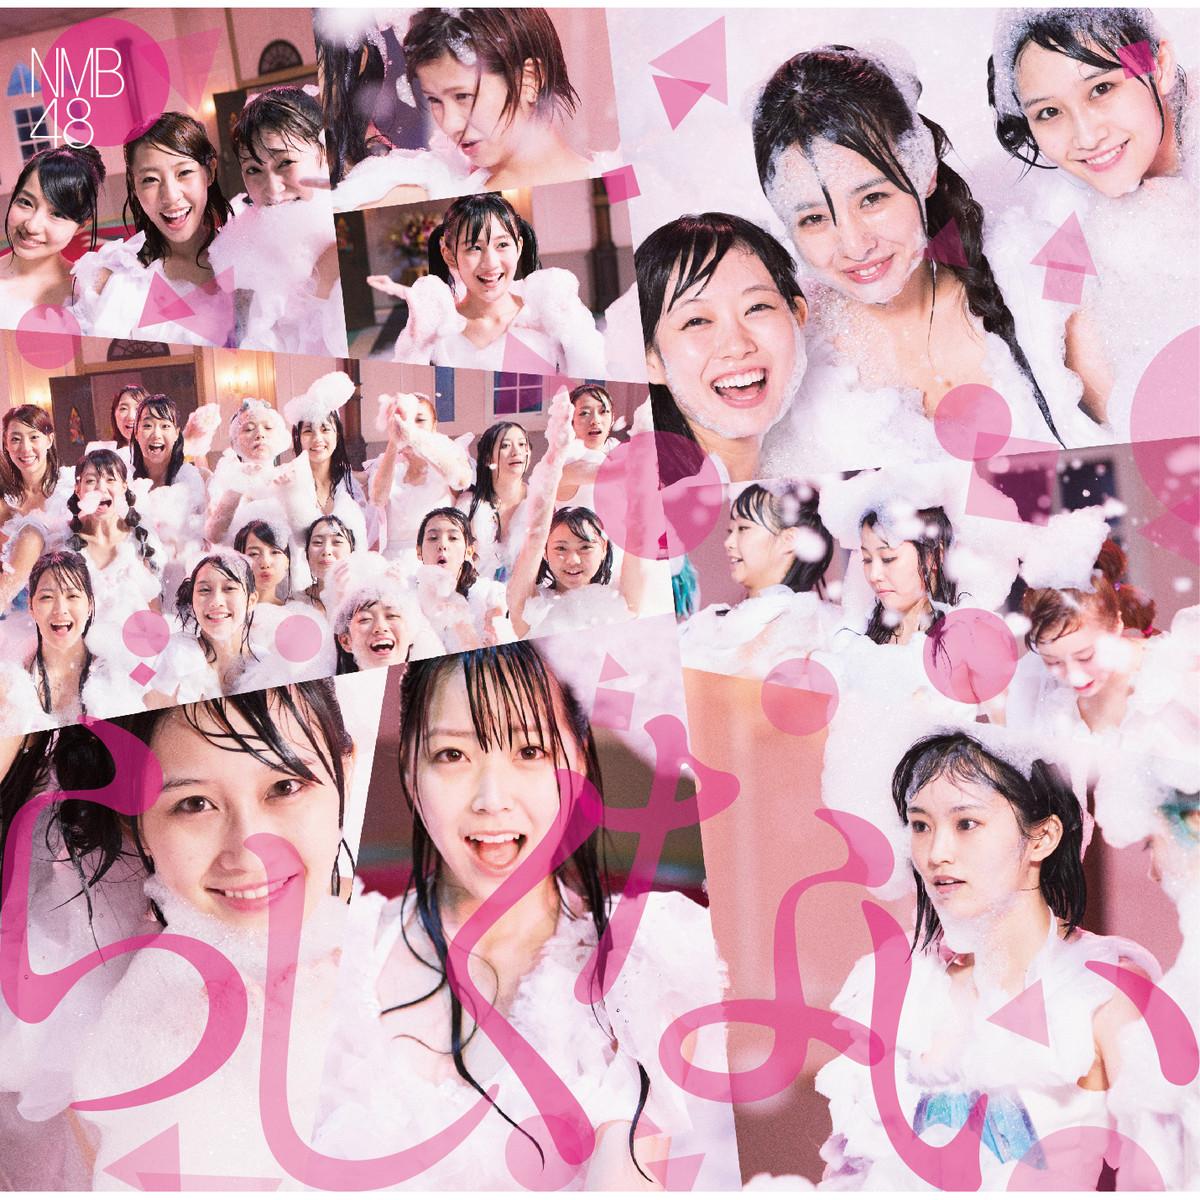 20151206.06.03 NMB48 - Rashikunai (Type A) cover 1.jpg